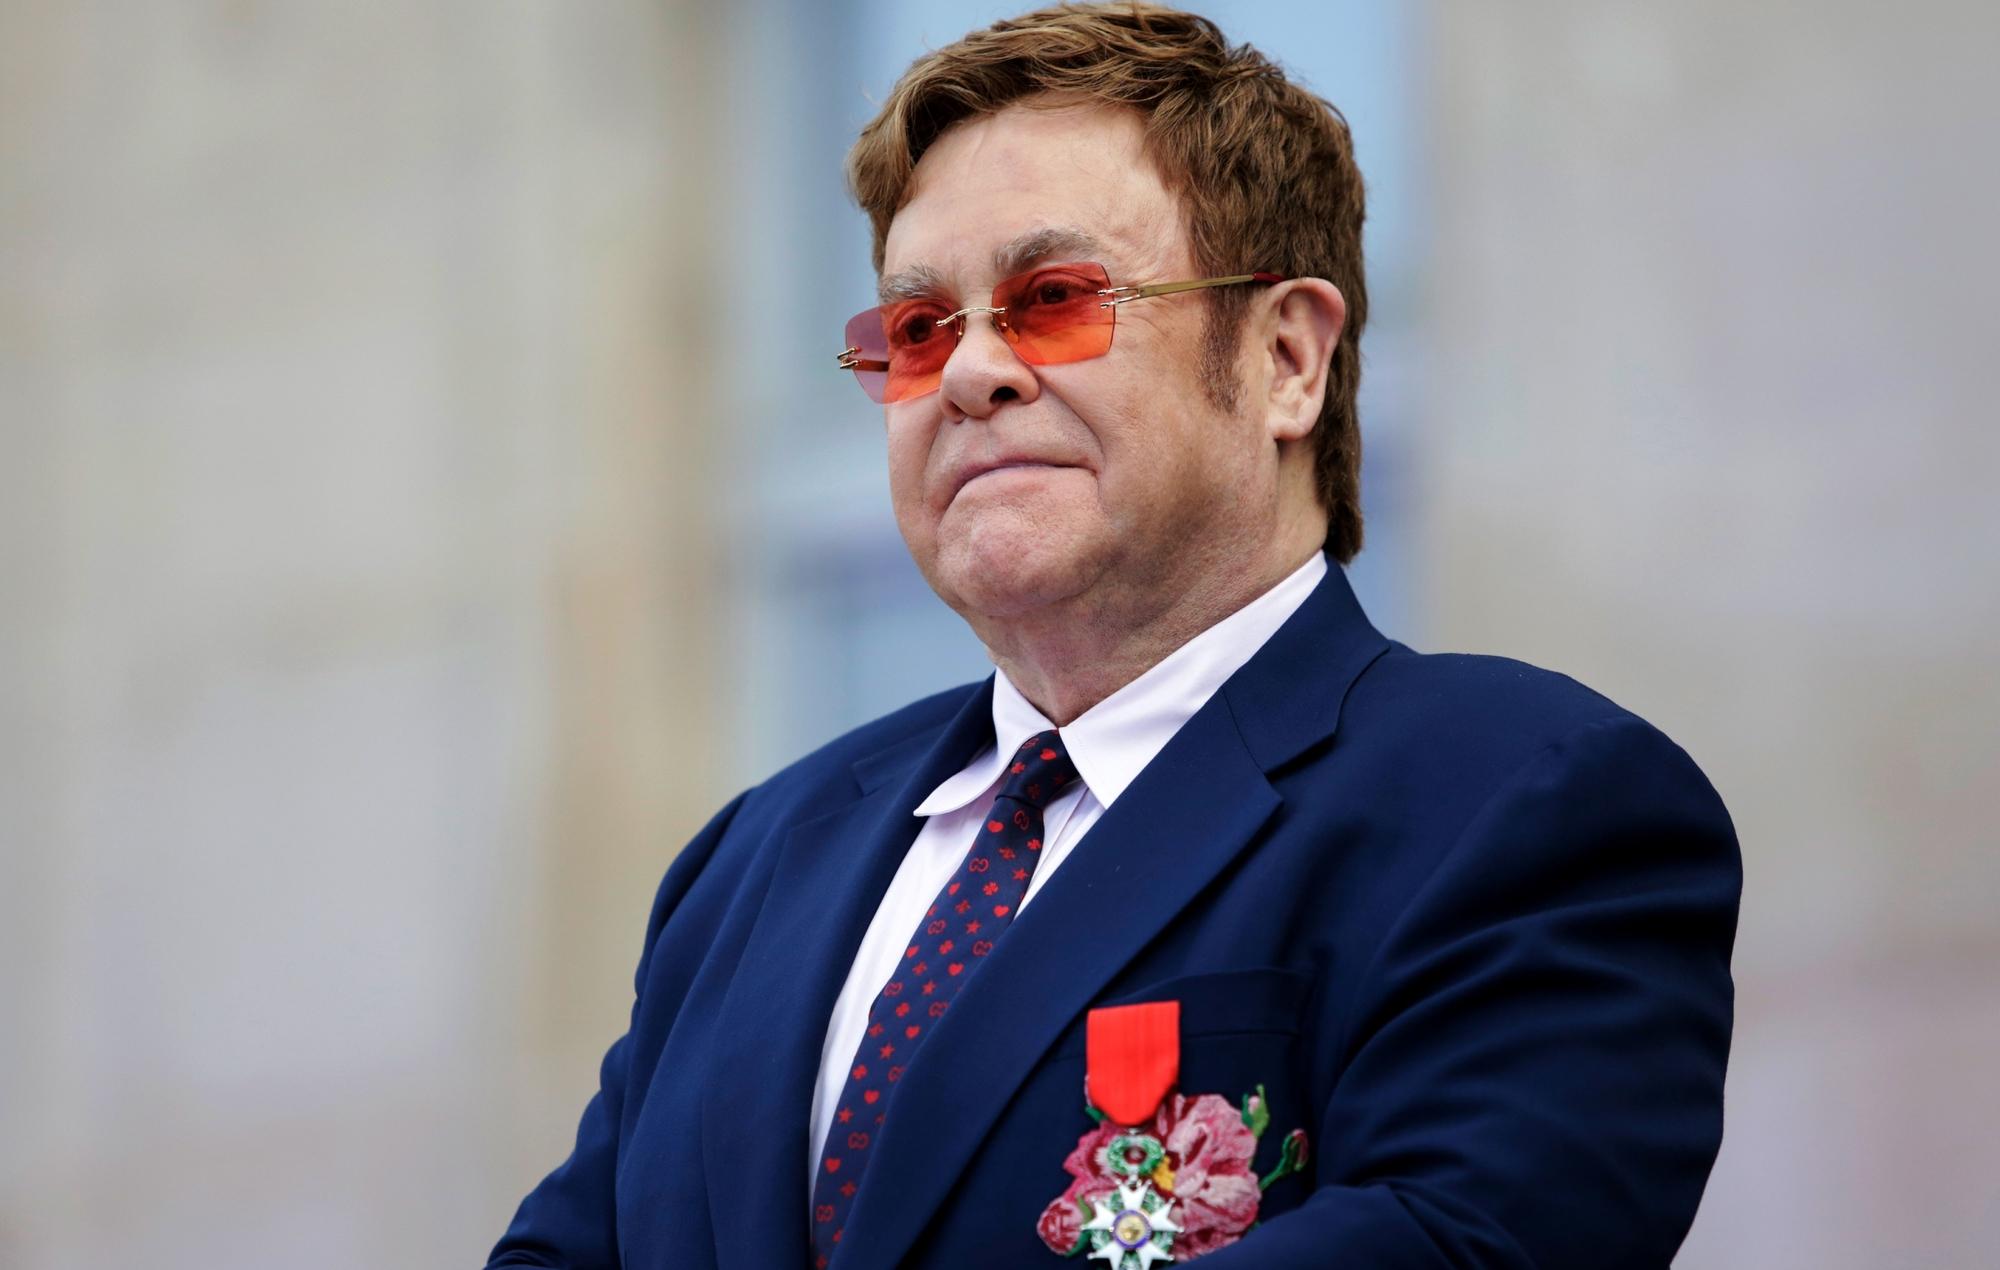 The Decorated Sir Elton John